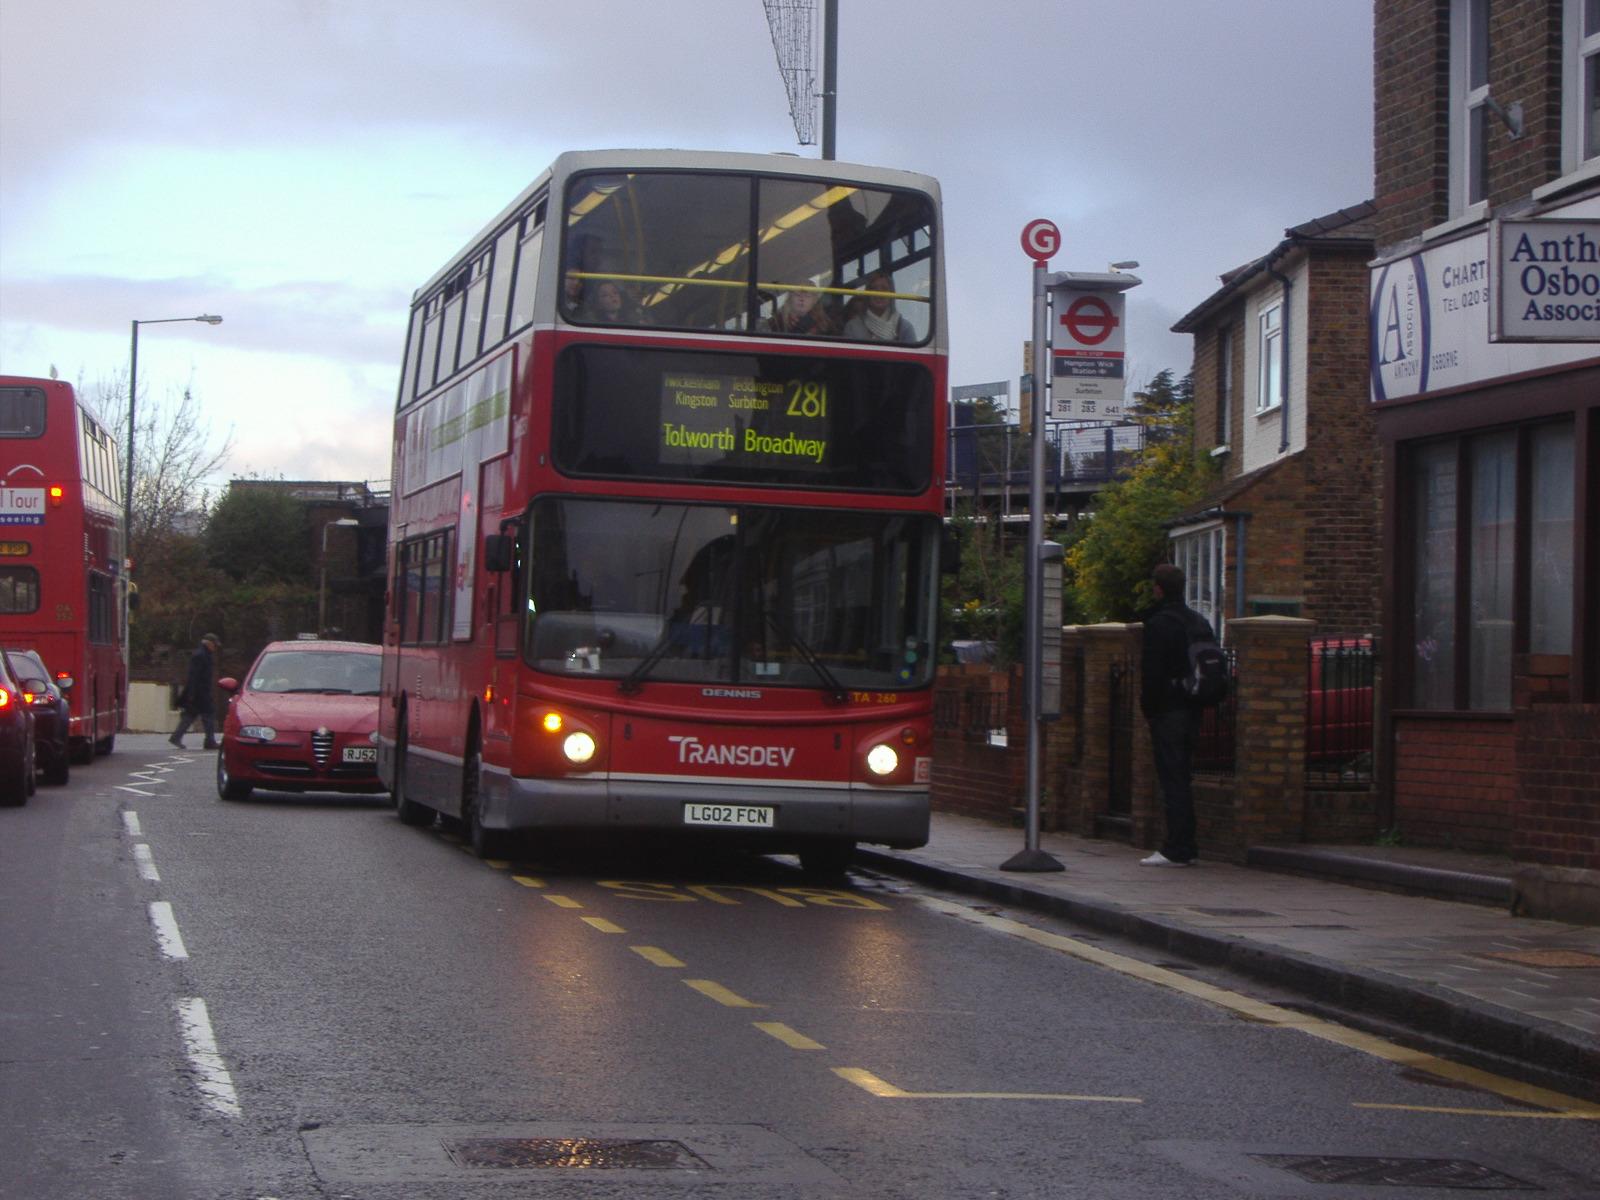 File:London Buses route 281 Hampton Wick jpg - Wikimedia Commons